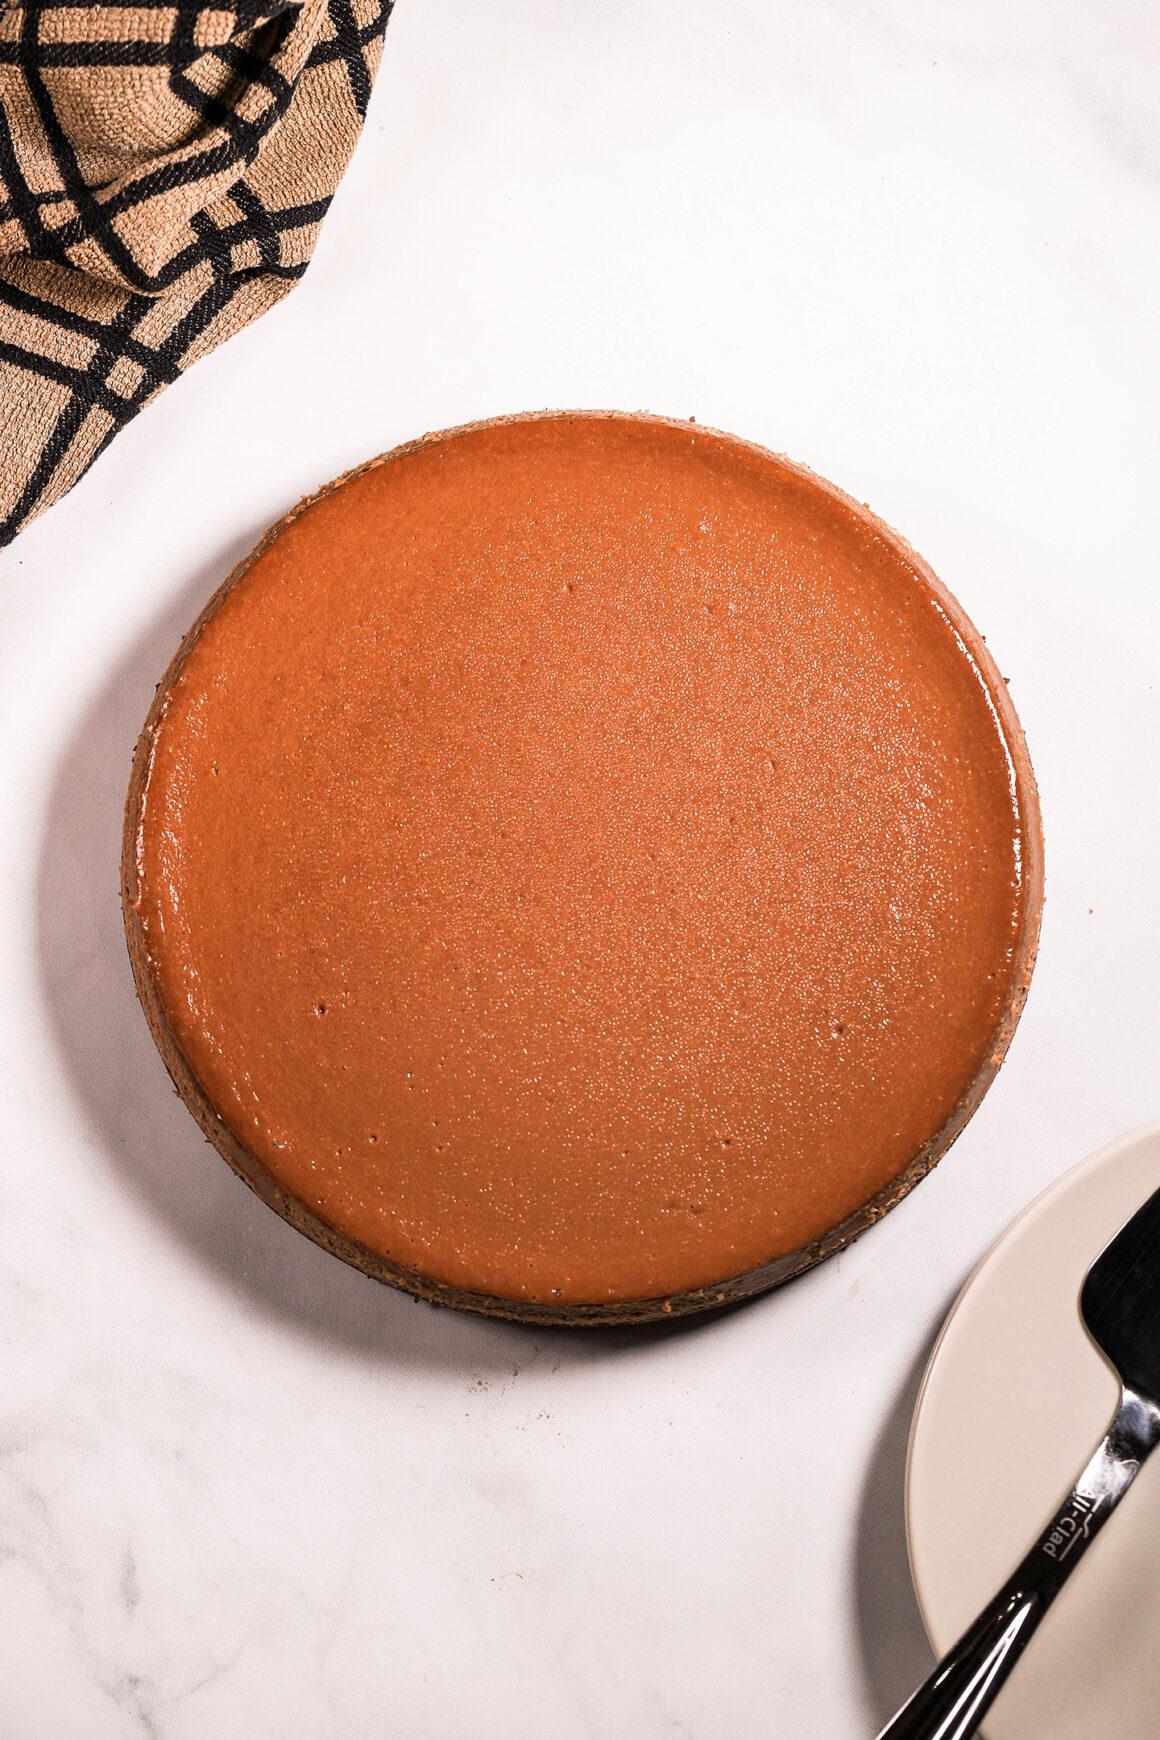 Whole Mocha Cheesecake